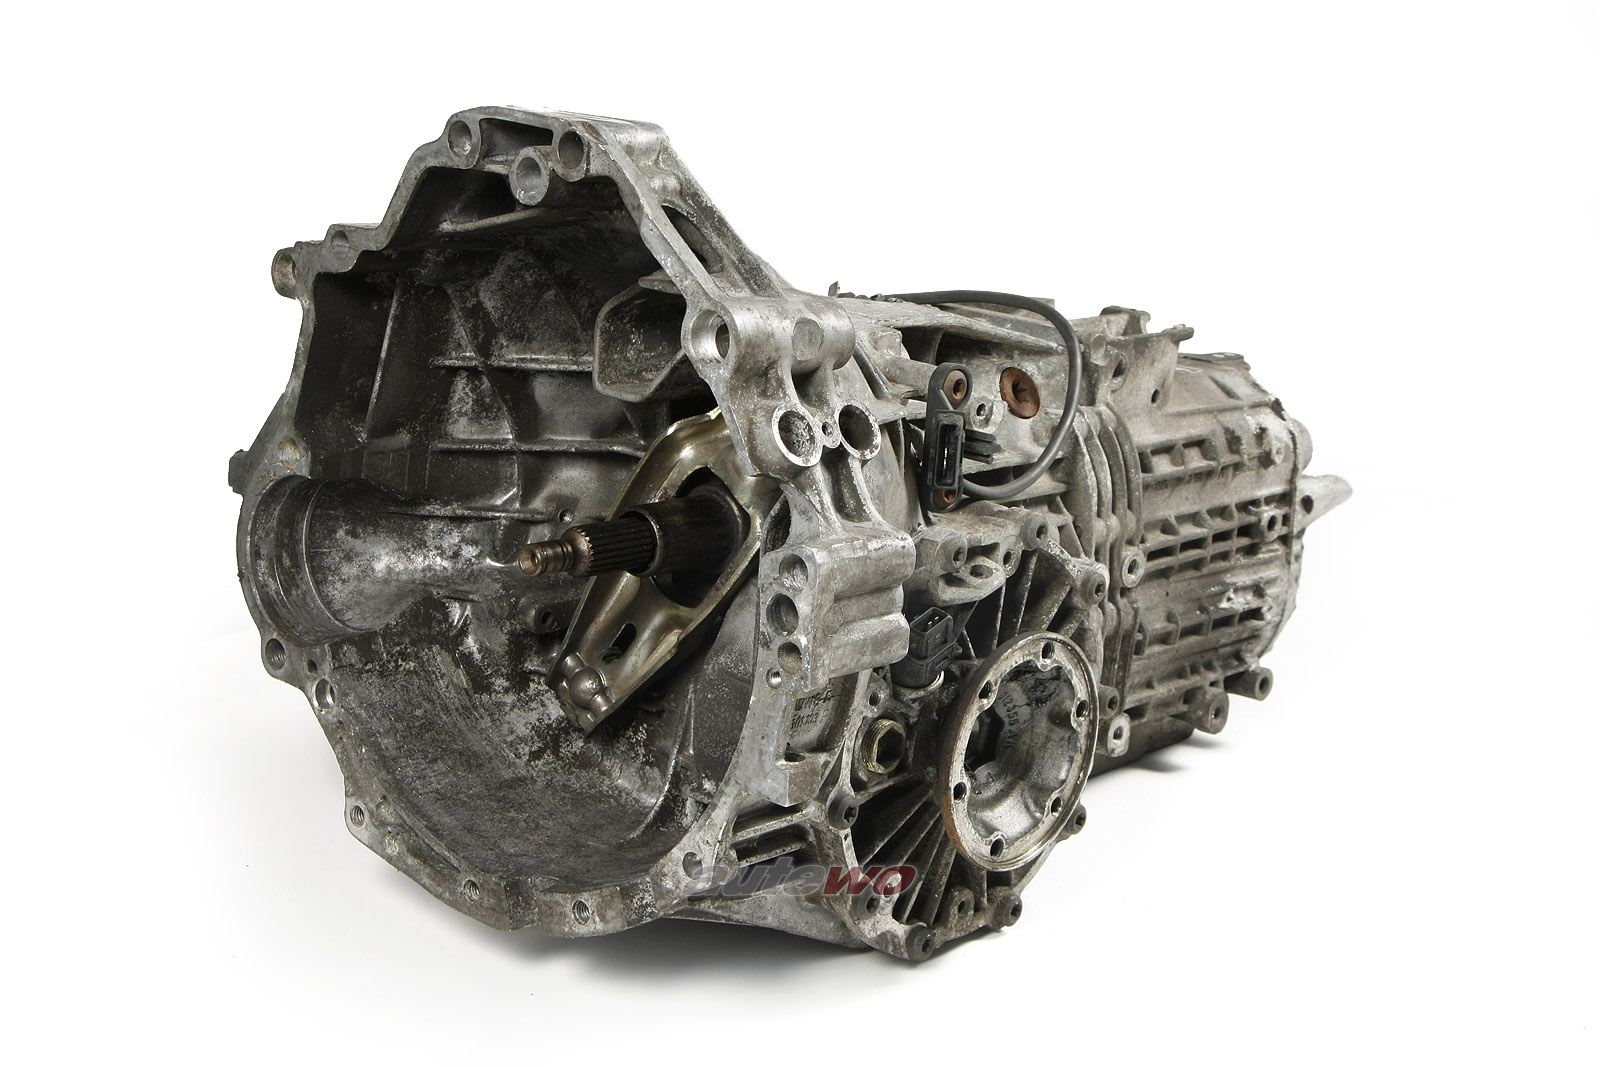 012300053 X Audi/VW A4 B5/A6 4B/Passat 1.8l Getriebe 5-Gang DHW 28086